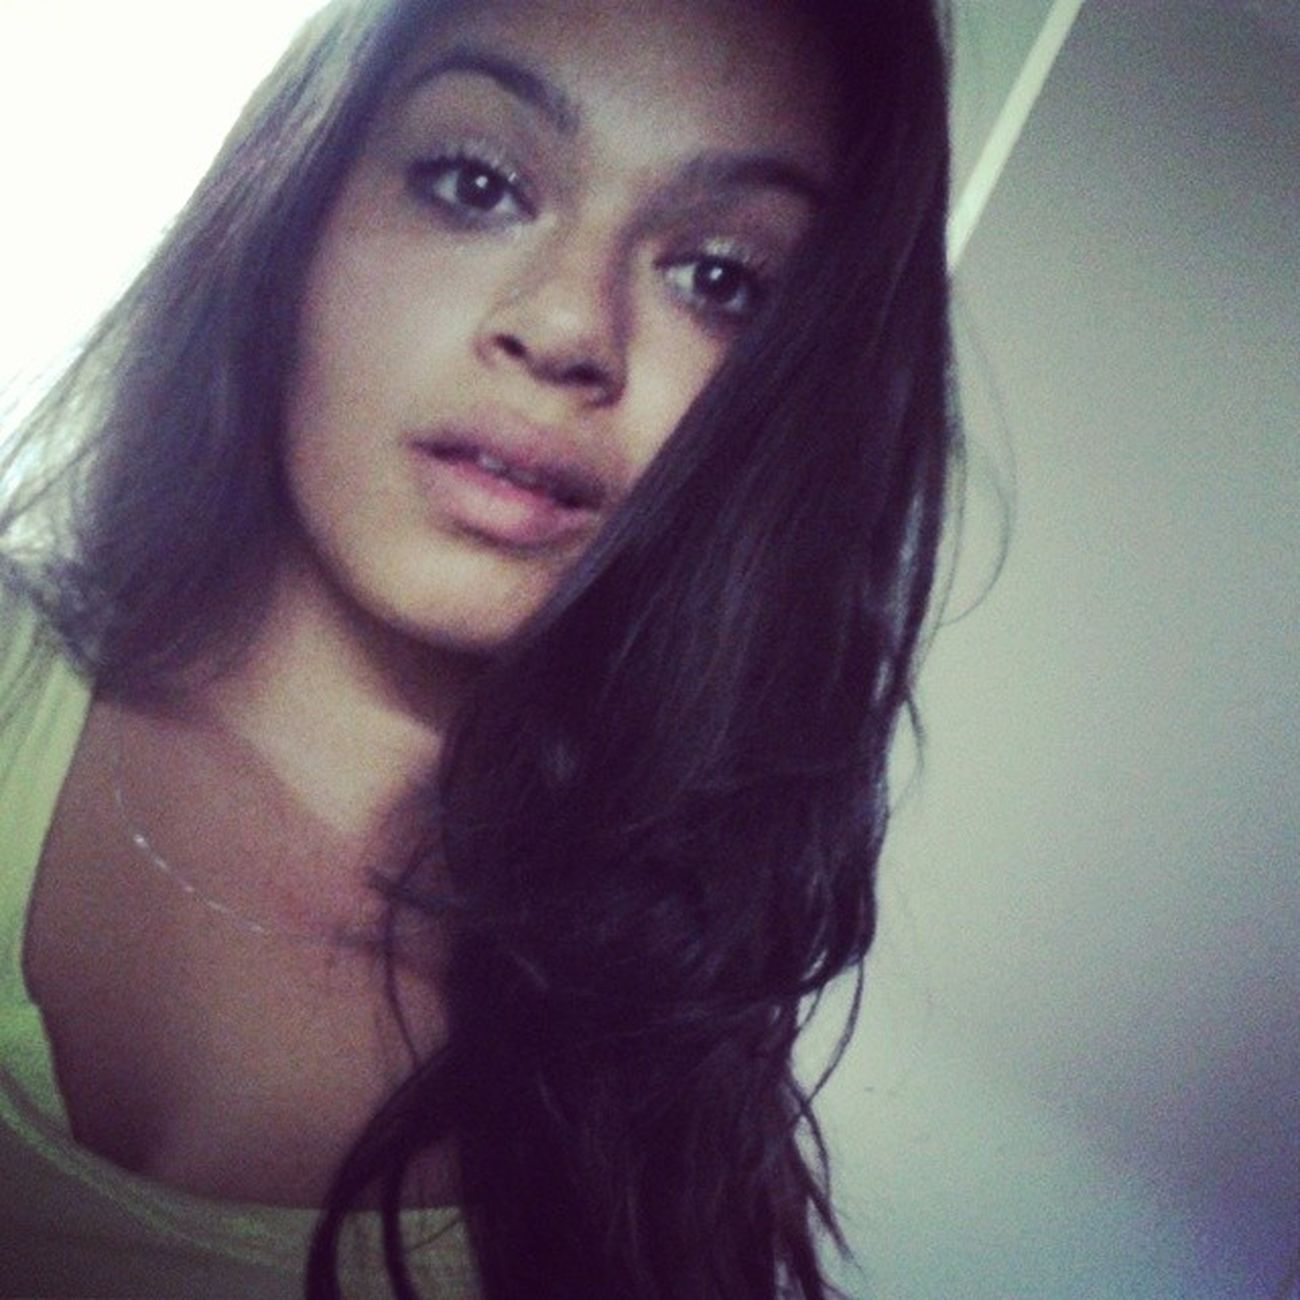  PrimeiraDoAno 2014 Like Love girl me brazilian GoodVibes positividade picofday cool luck tudodebom